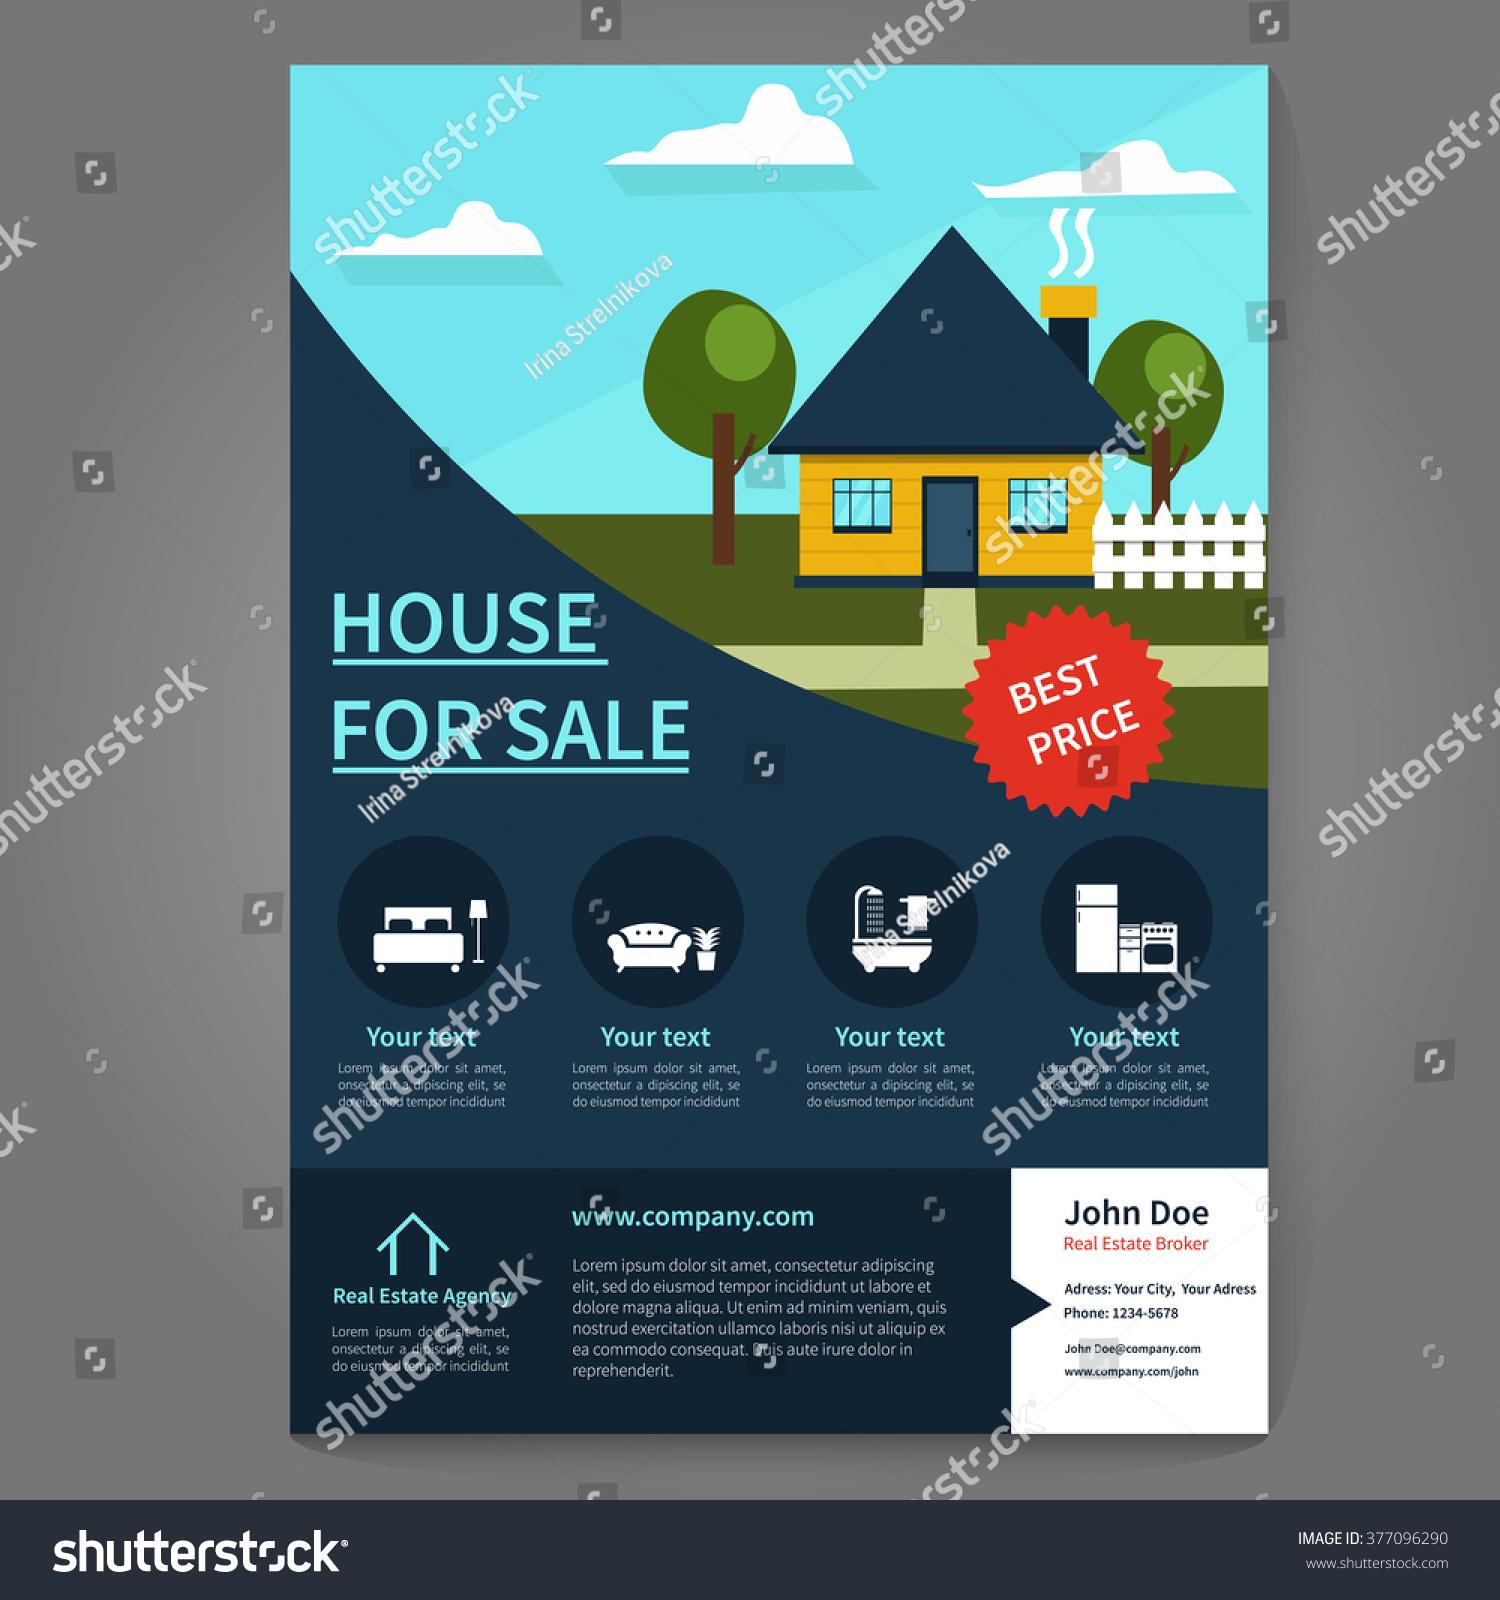 real estate broker flyer poster template stock vector  real estate broker flyer and poster template flyer concept